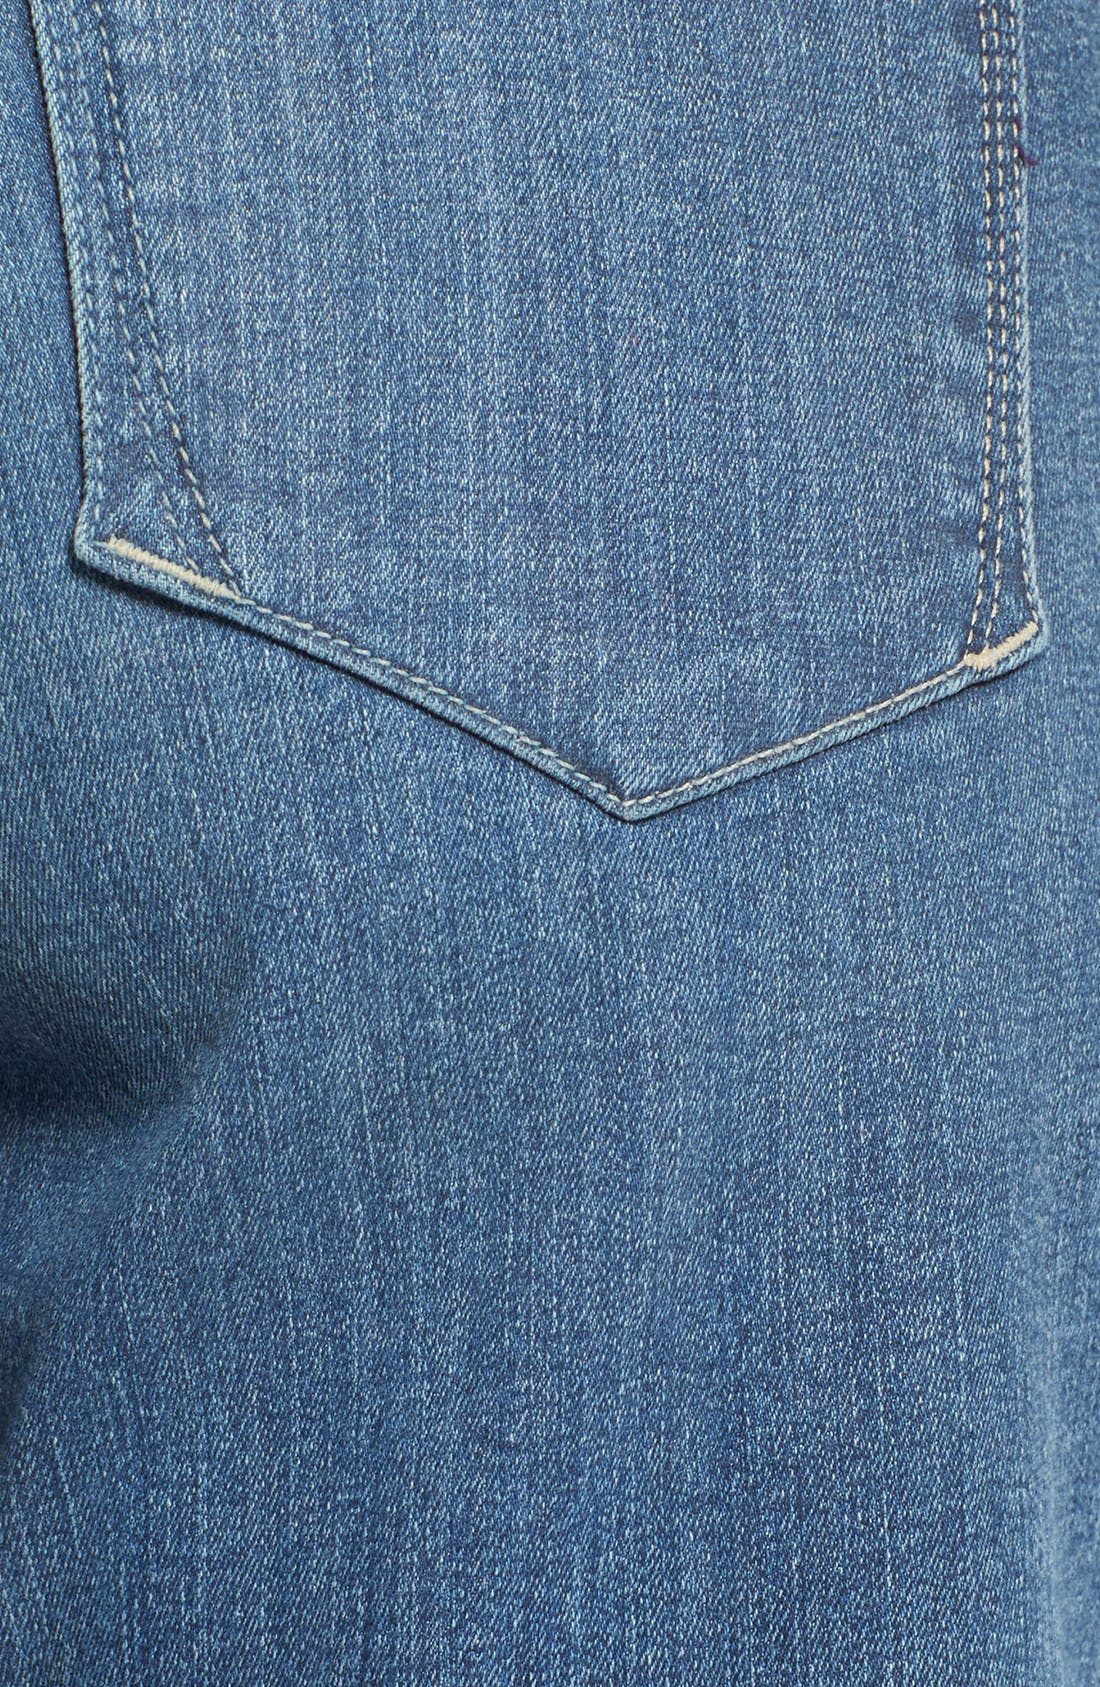 Briella Roll Cuff Stretch Denim Shorts,                             Alternate thumbnail 6, color,